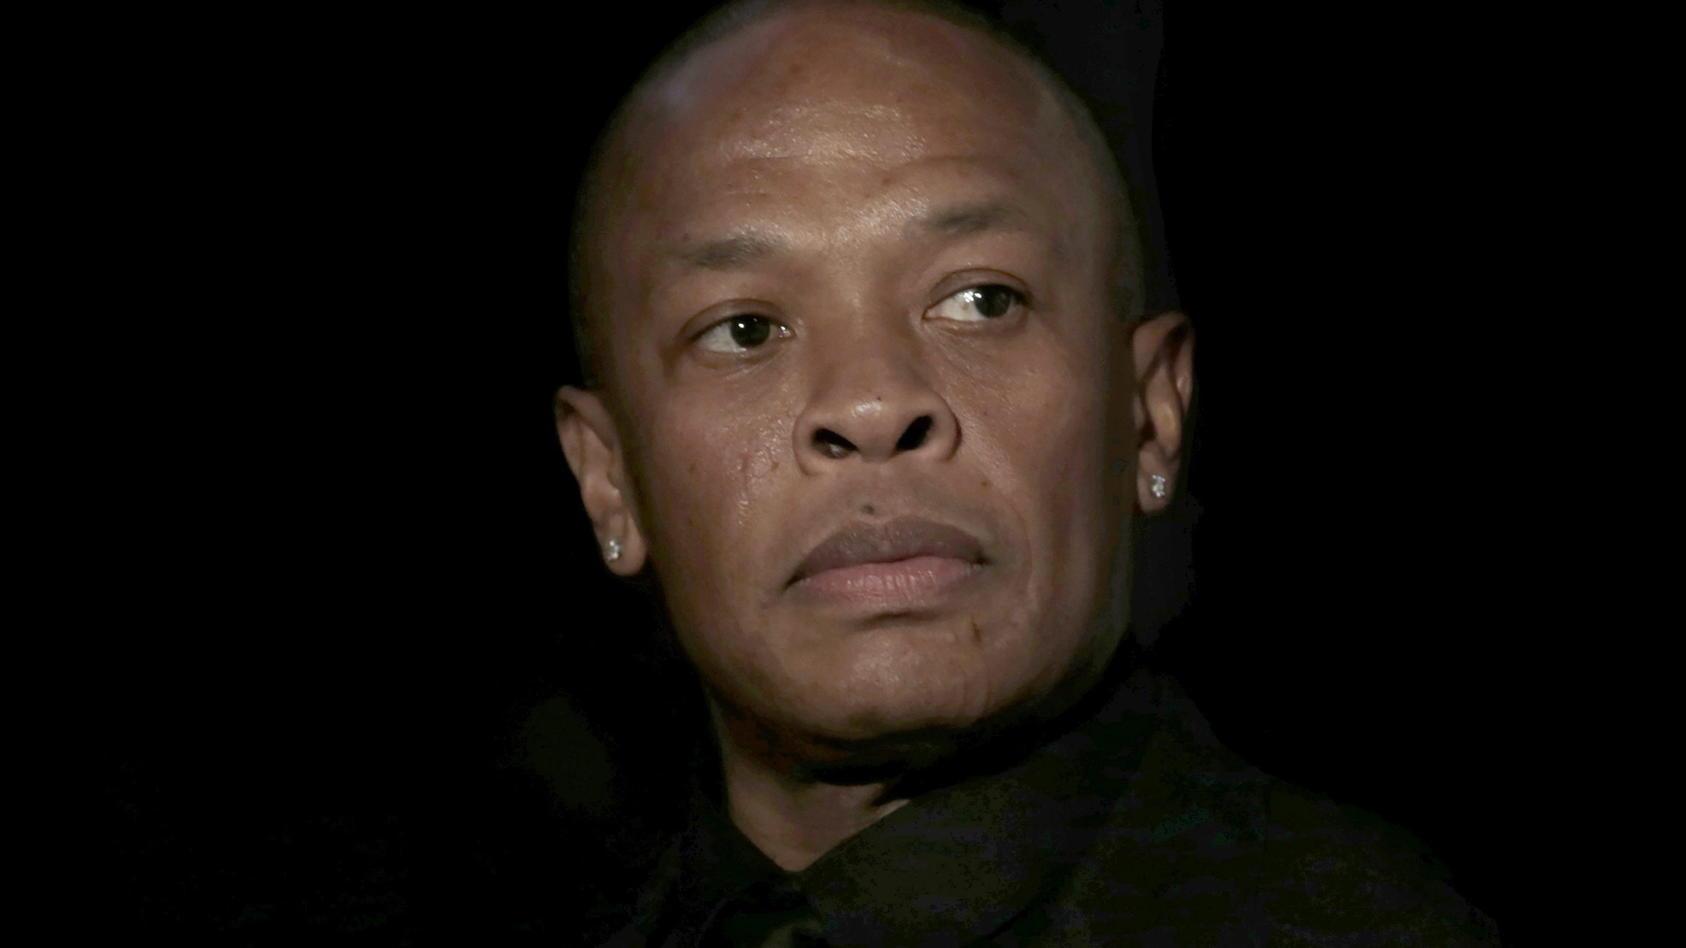 Dr. Dre hat kein enges Verhältnis zu seiner Tochter LaTanya Young.